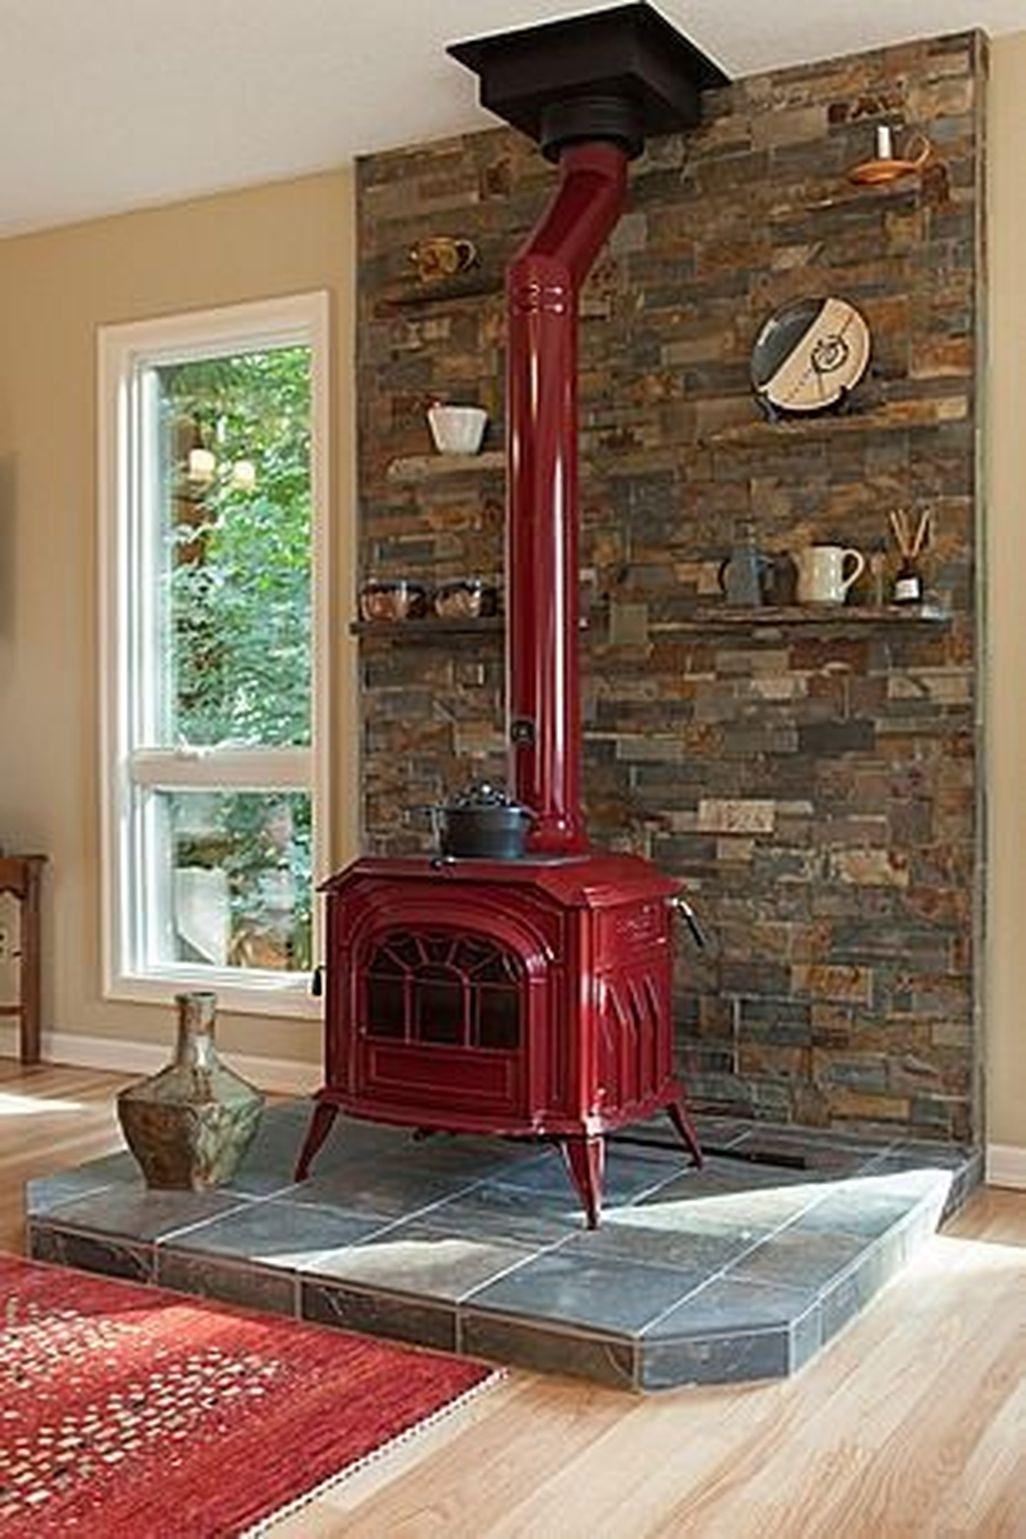 Inspiring Corner Fireplace Ideas In The Living Room 24